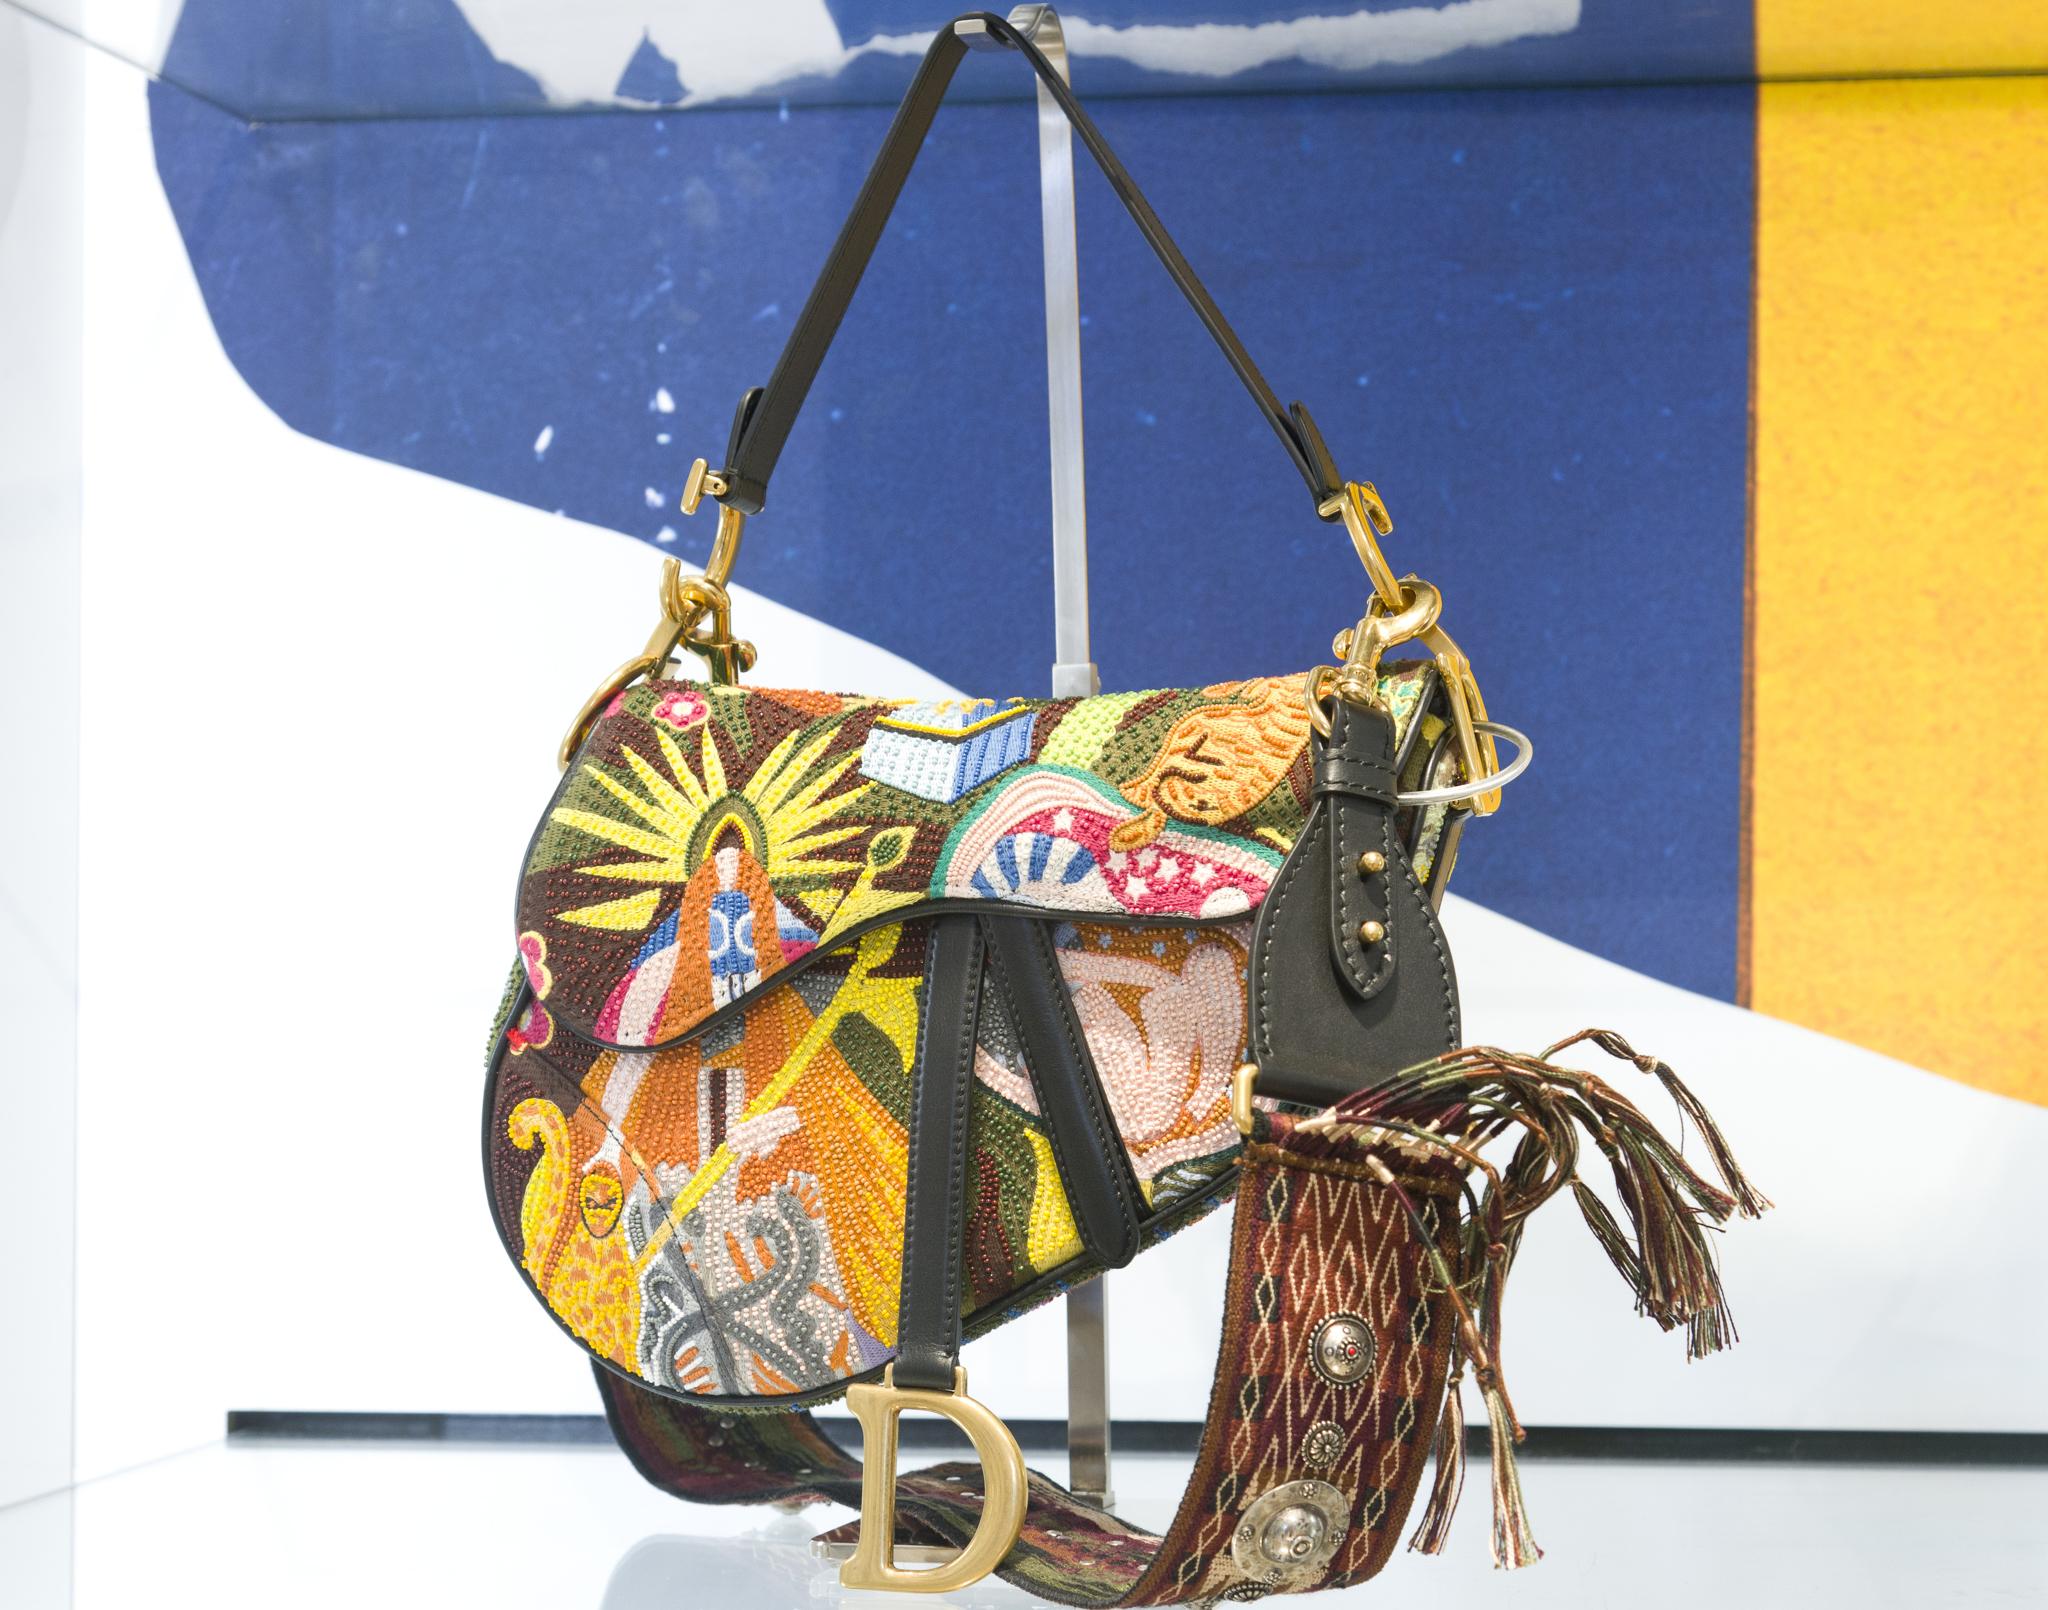 A Dior Saddle bag designed by Maria Grazia Chiuri.